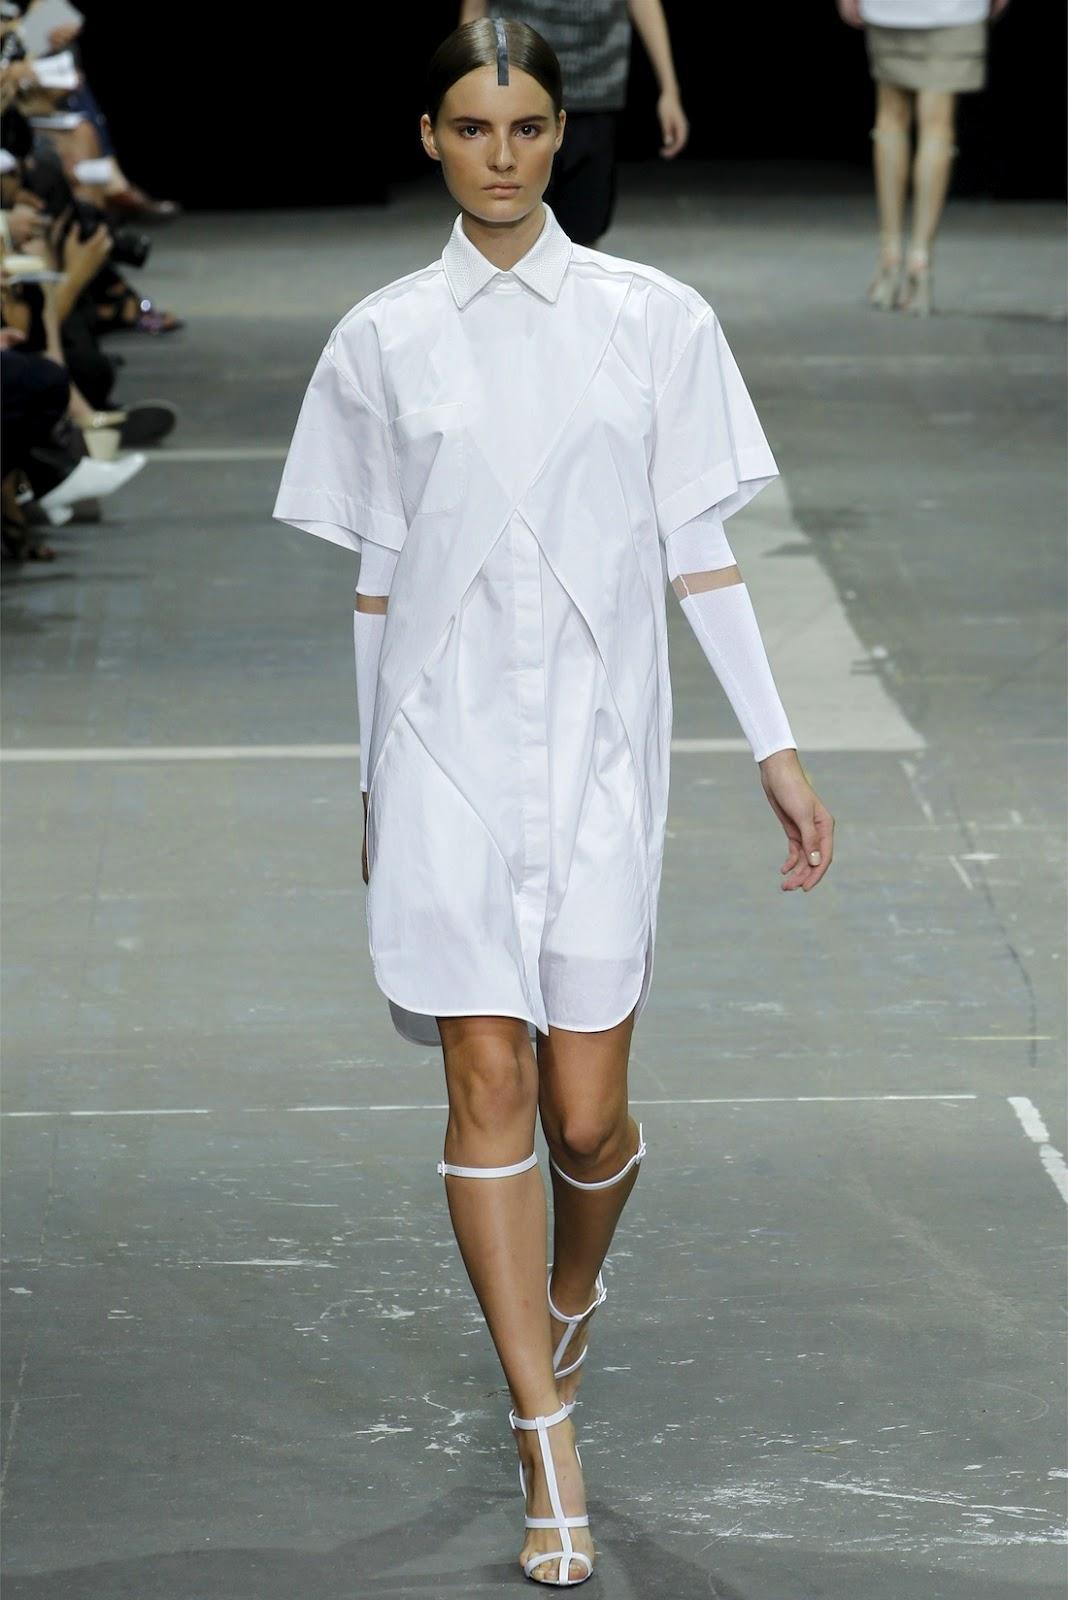 Alexander Wang S S 13 New York Visual Optimism Fashion Editorials Shows Campaigns More